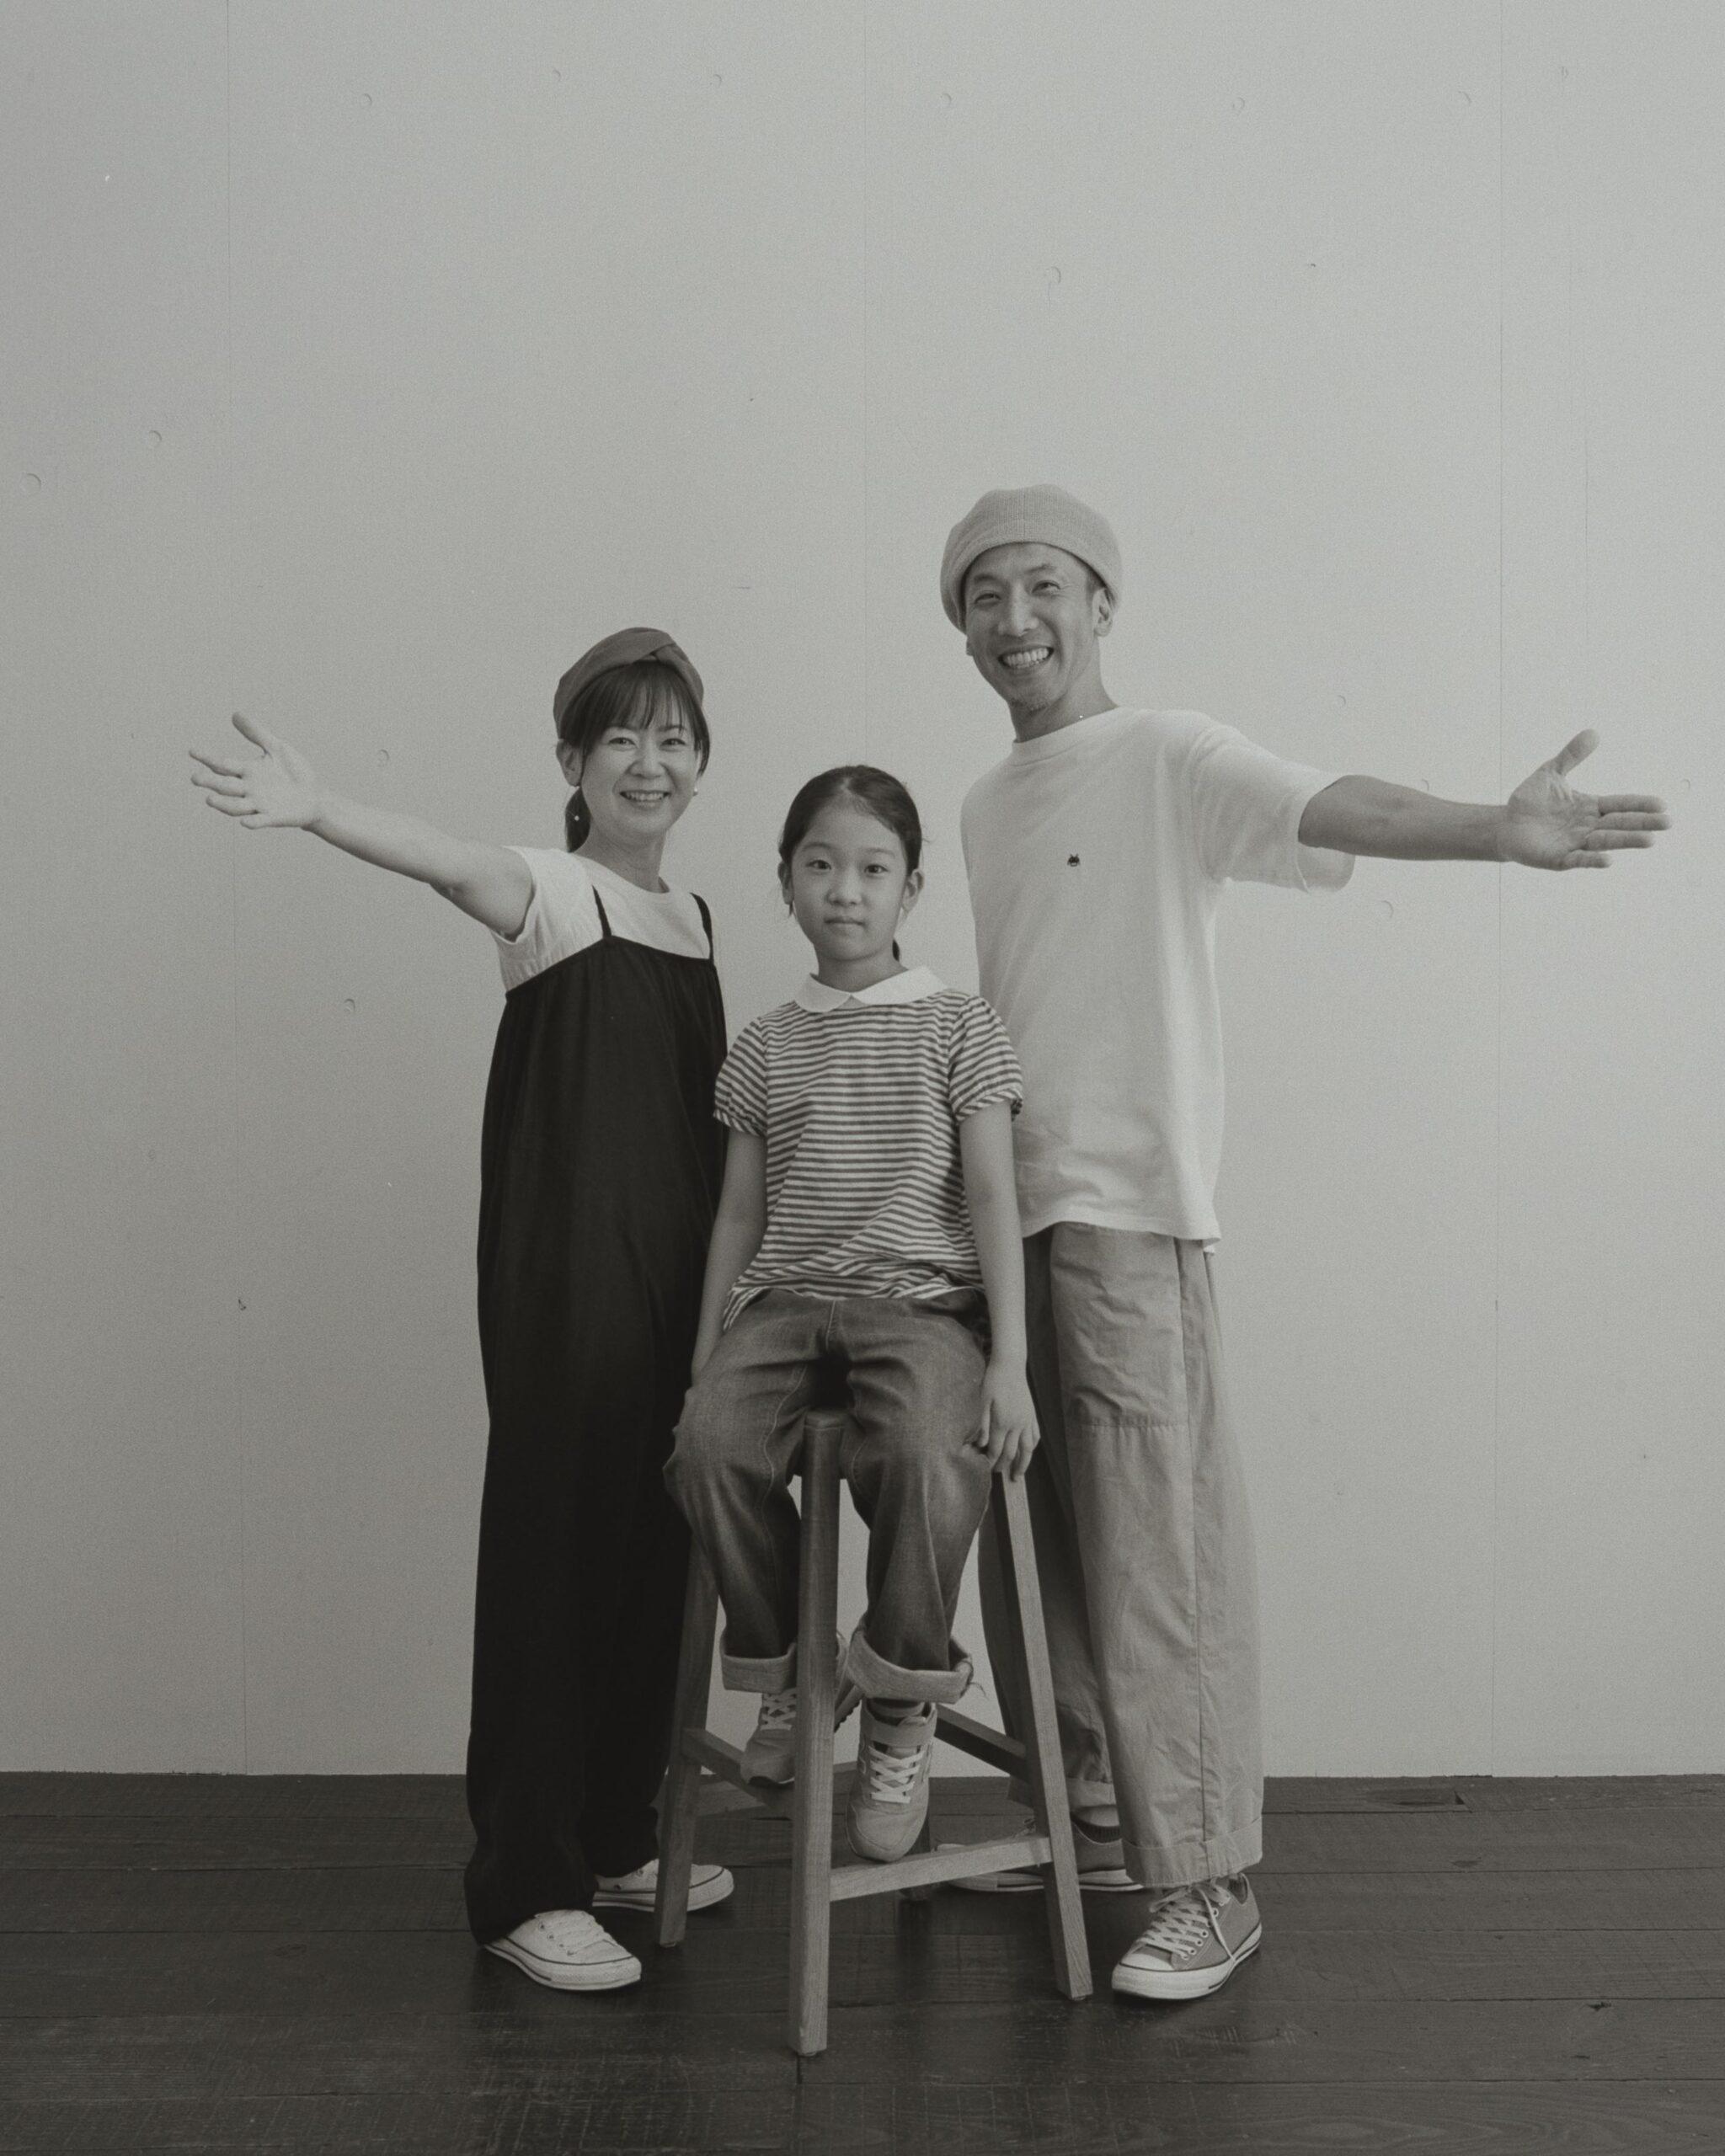 6/5(土)~6(日)大坊写真室@鶴身印刷所Vol.3開催です!